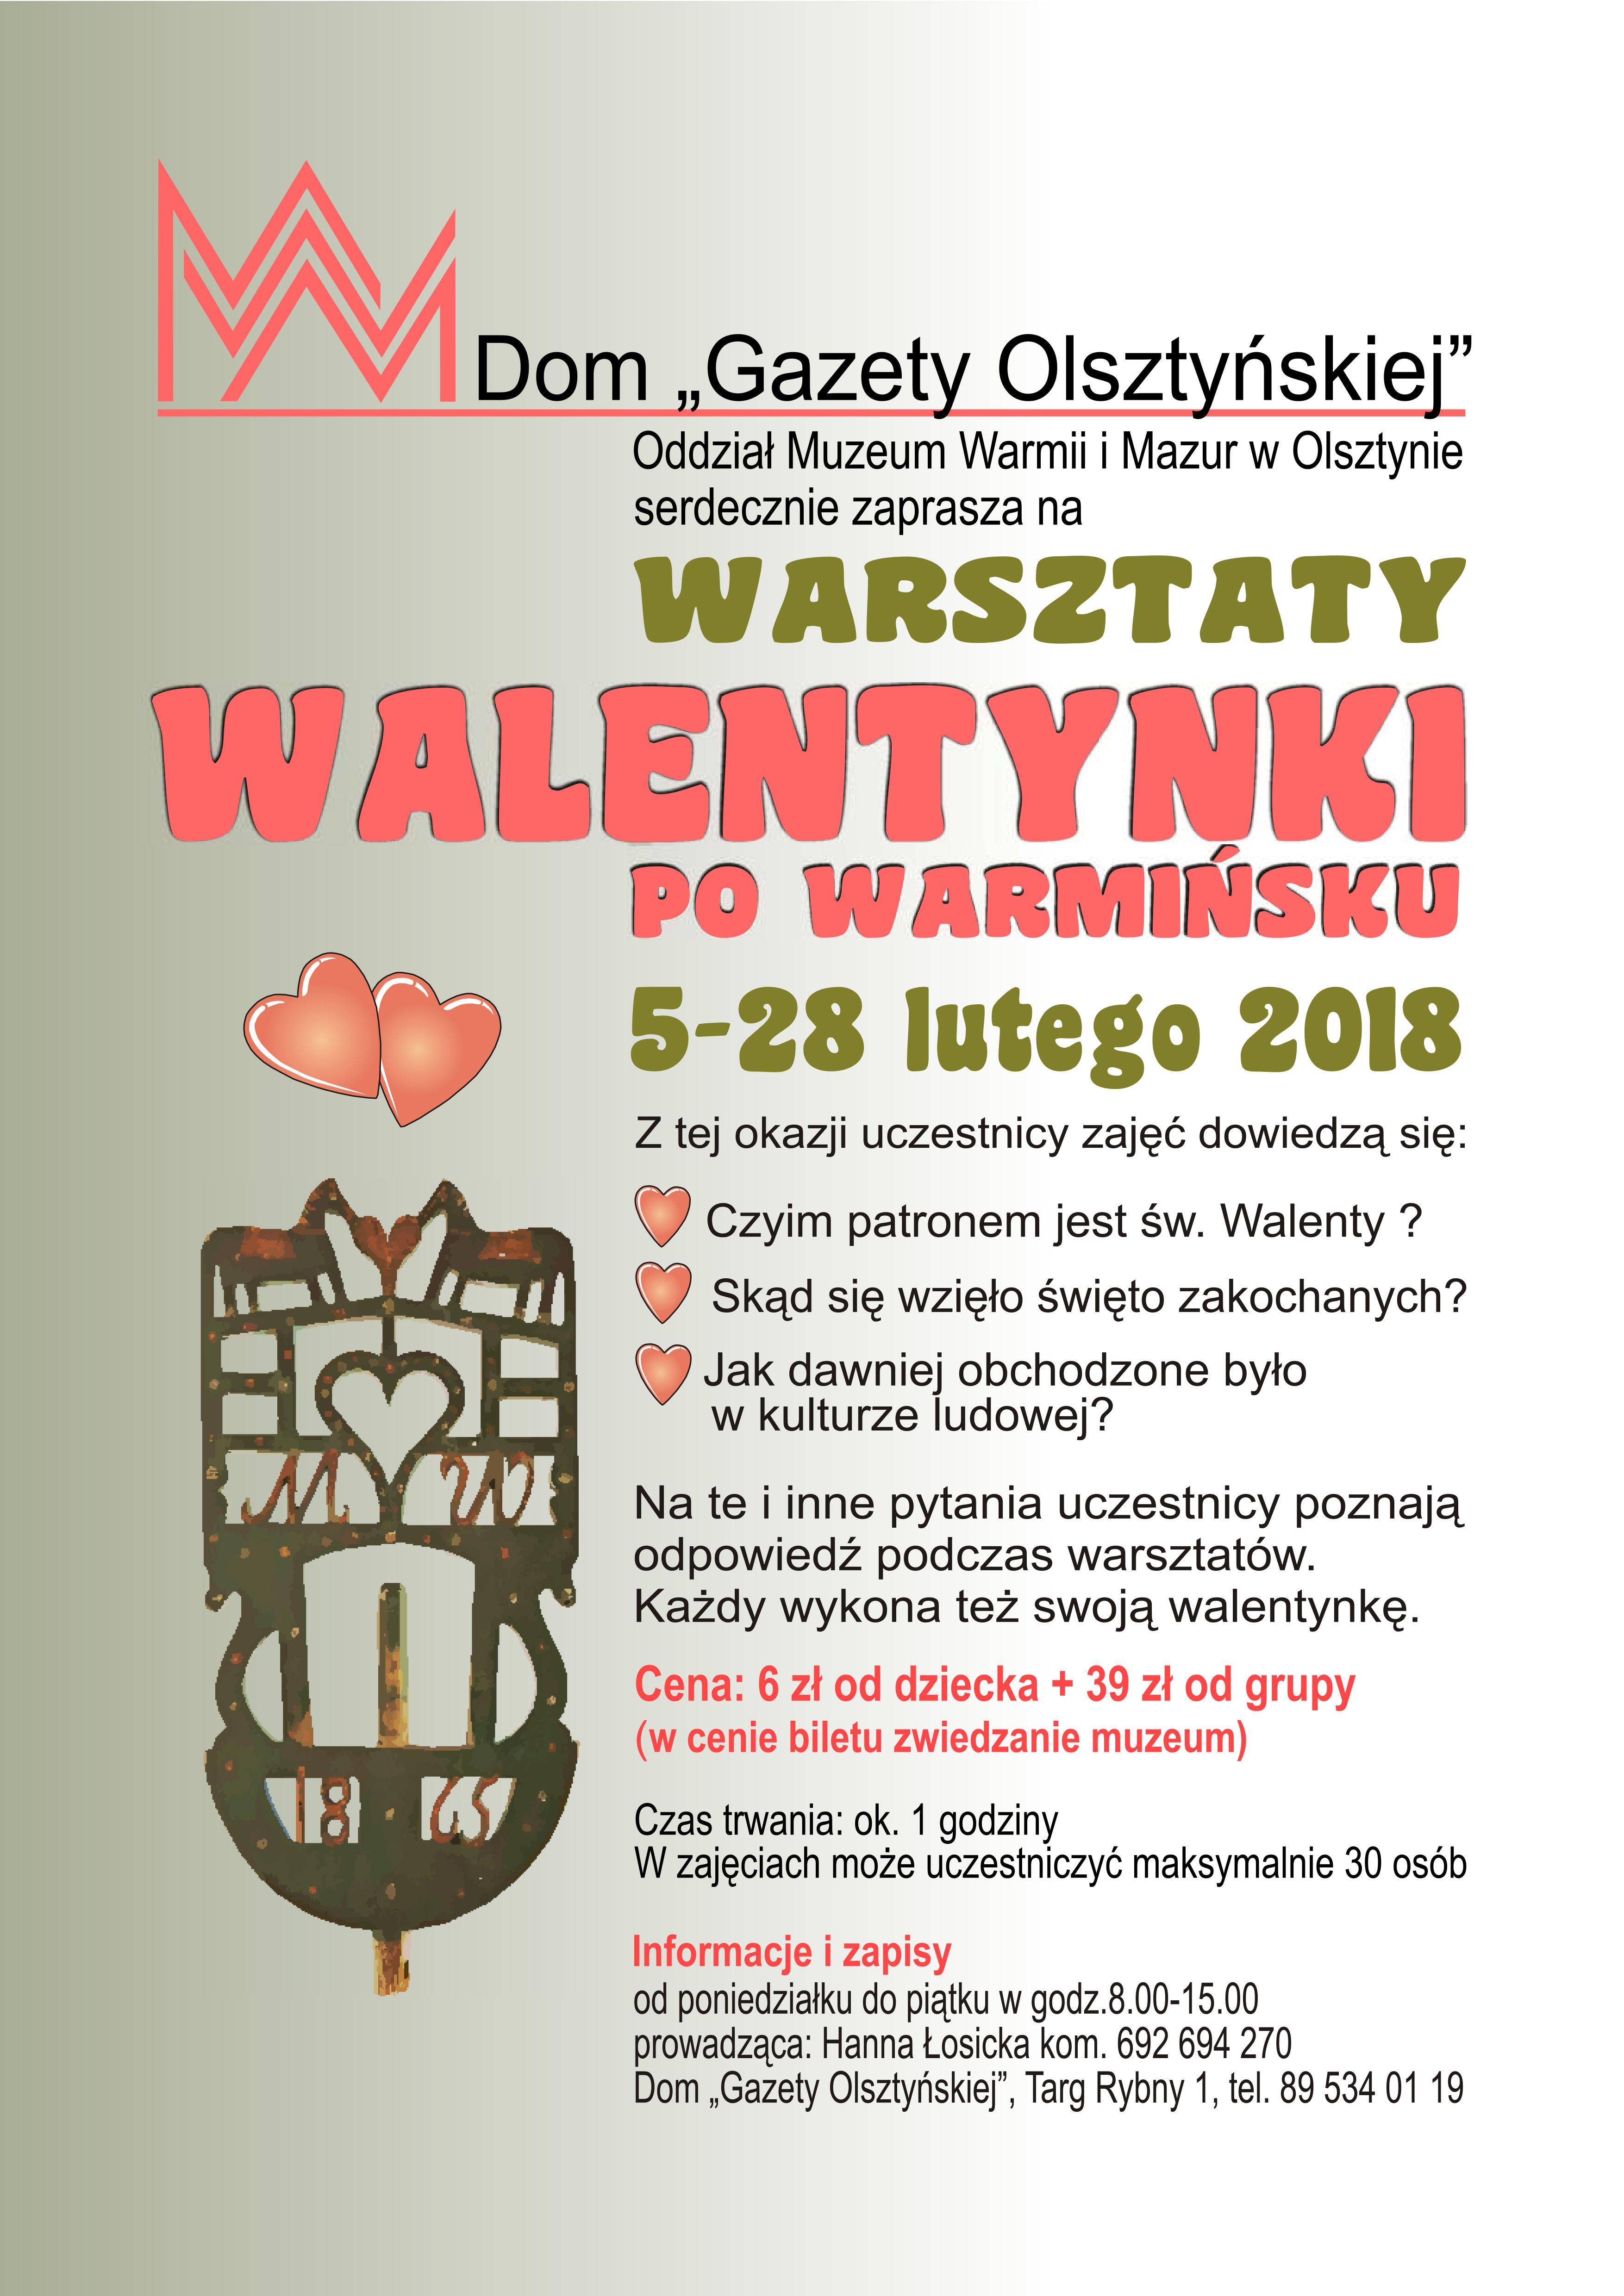 http://m.wmwm.pl/2018/02/orig/dgo-walentynki-2018-do-internetu-6014.jpg